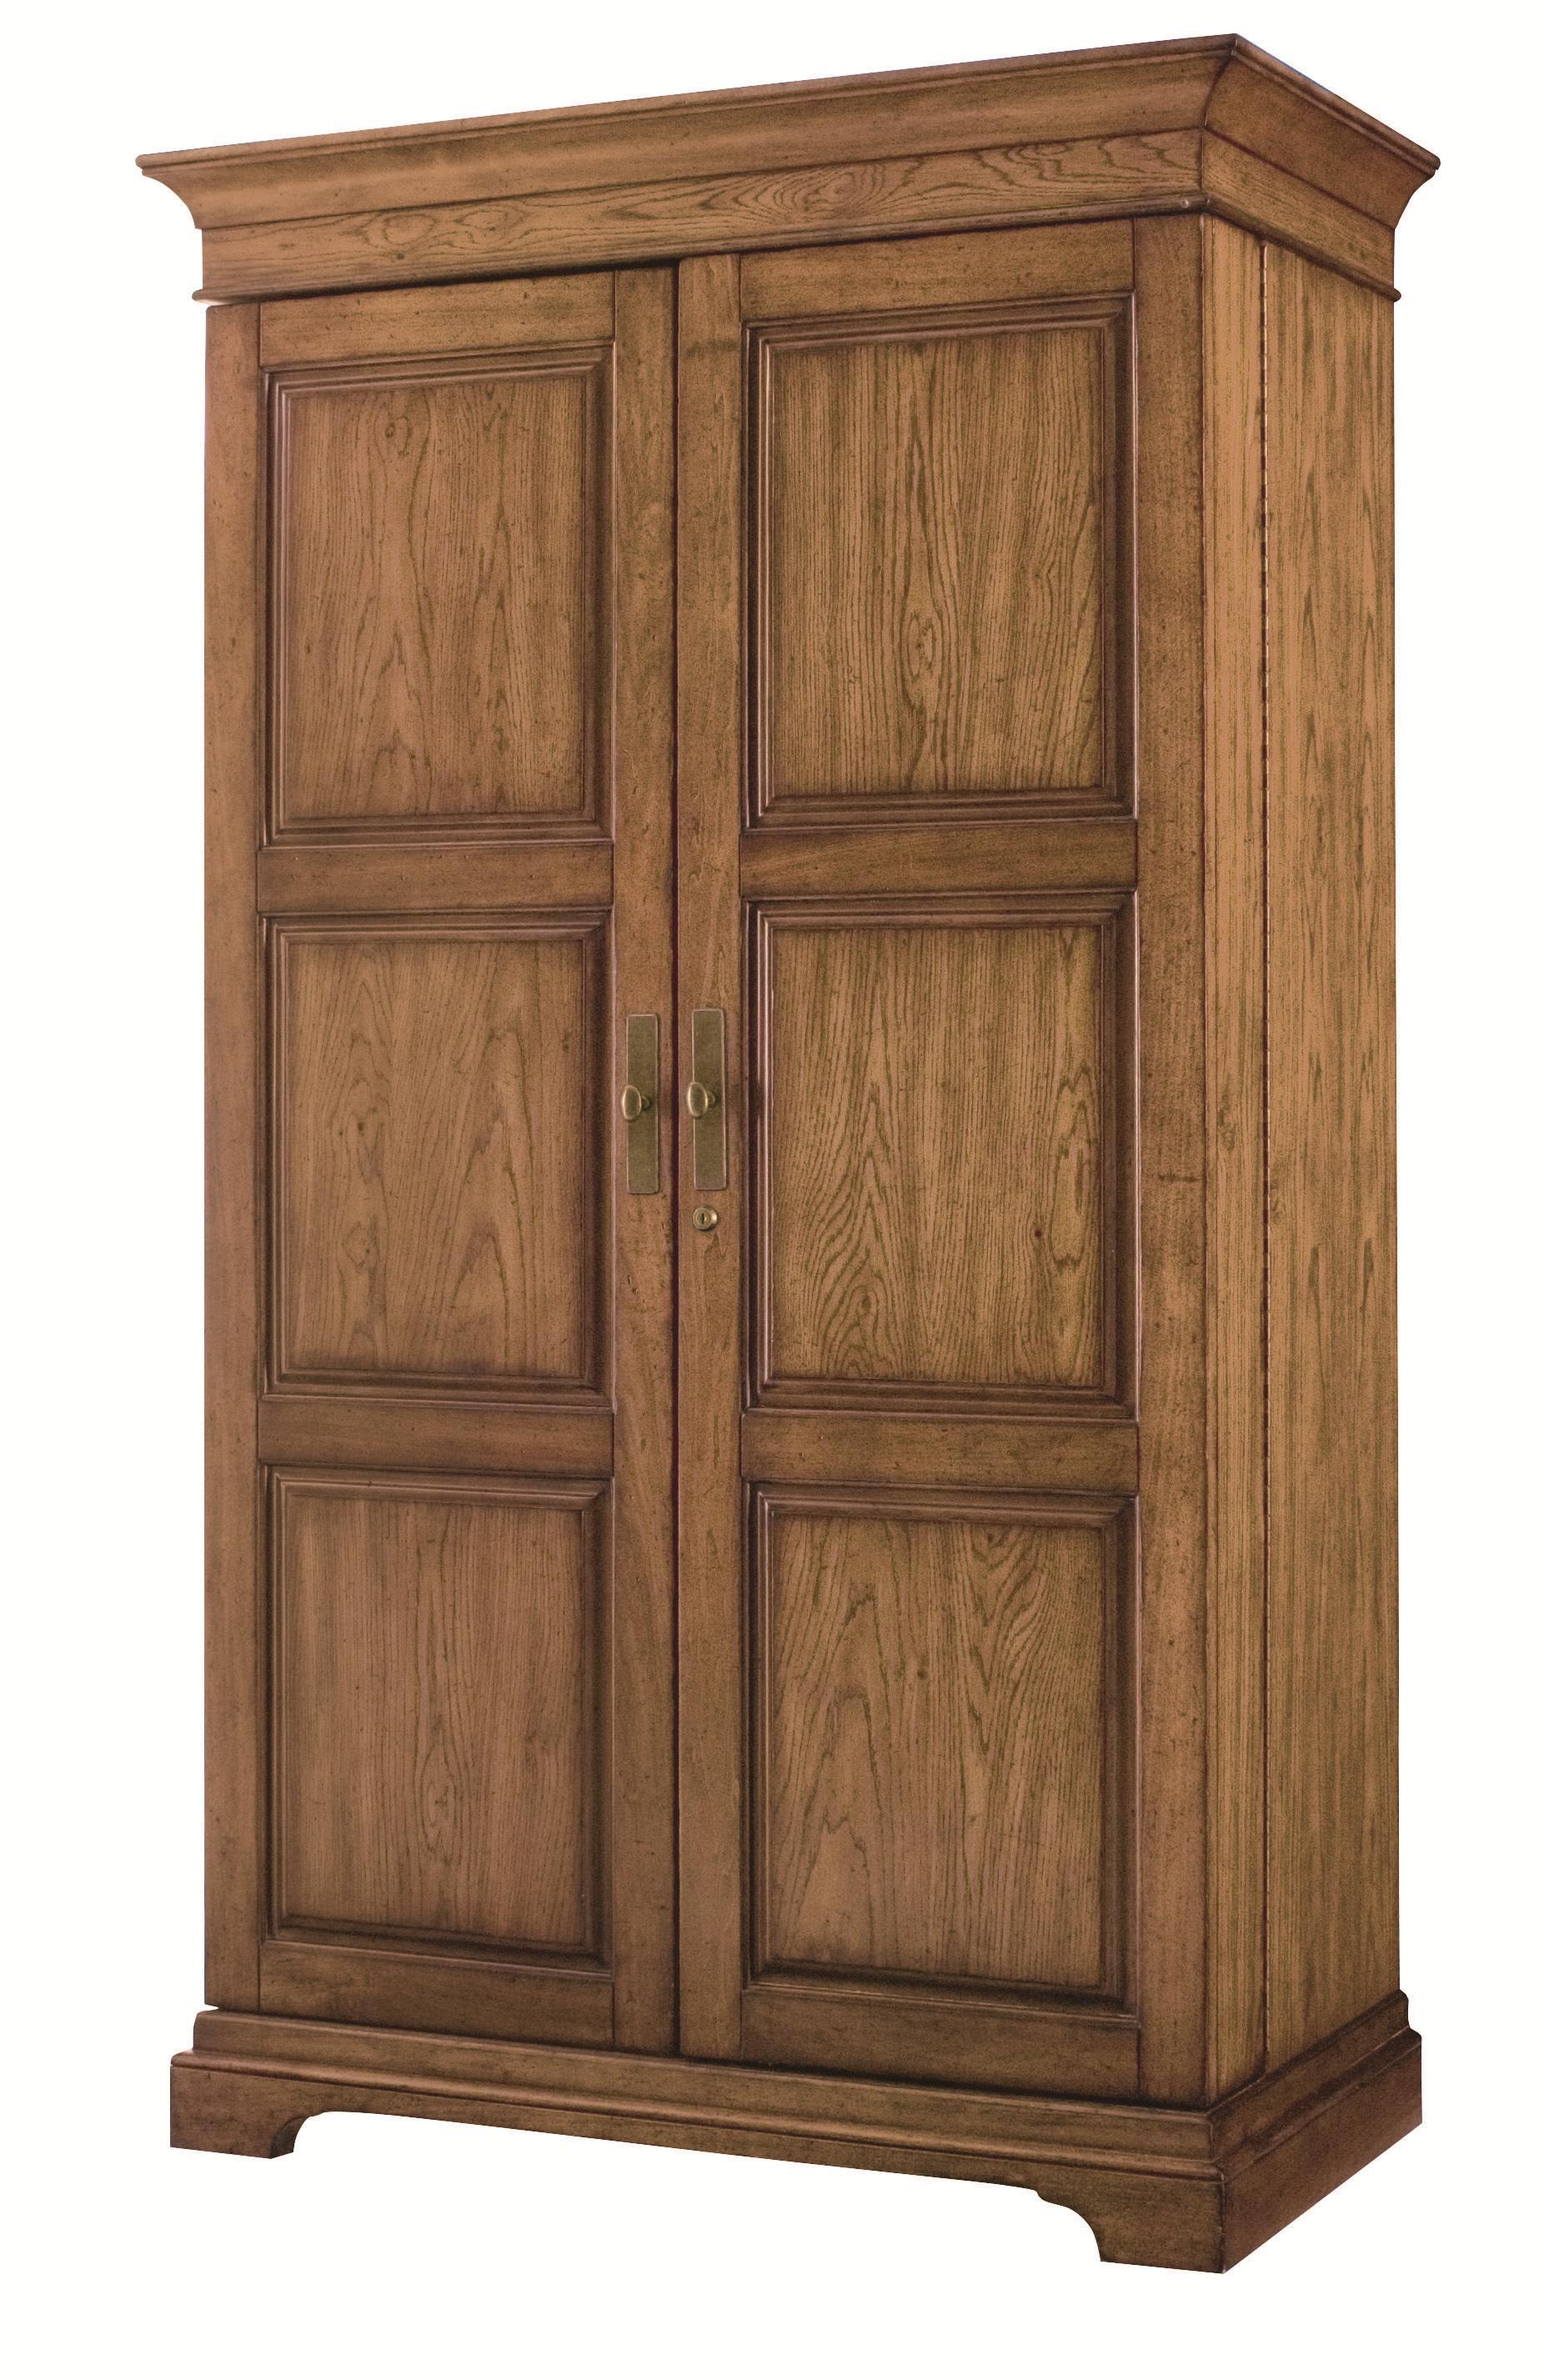 Hammary Hidden Treasures Drinks Cabinet - Item Number: 090-453